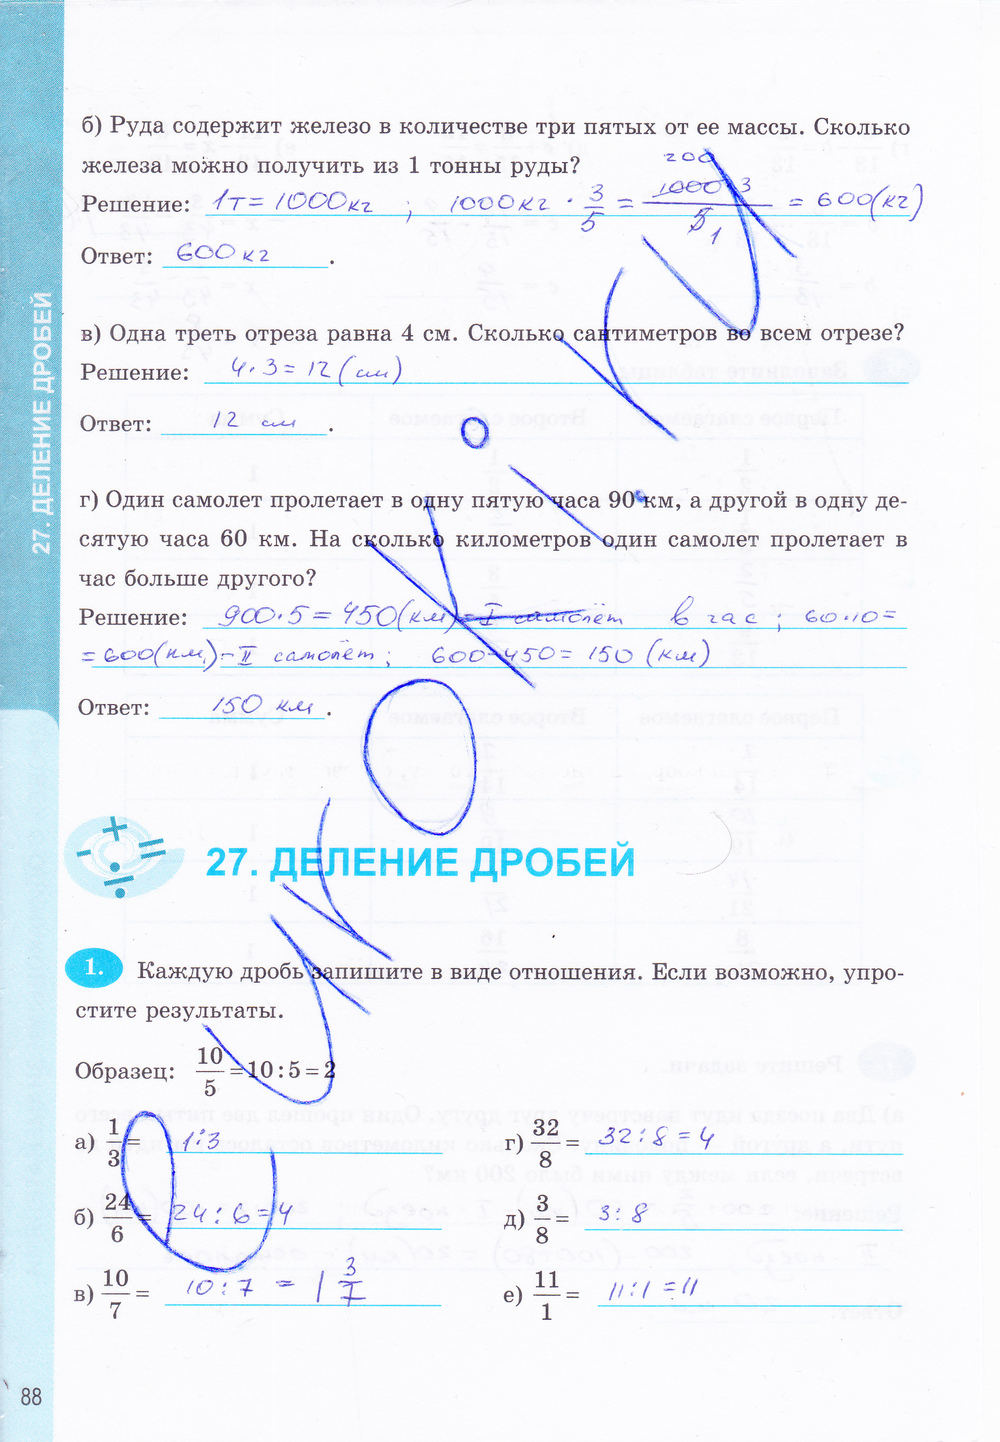 Подсказка по математике задача 6 класс автор н.я.виленкин стр.85 упр